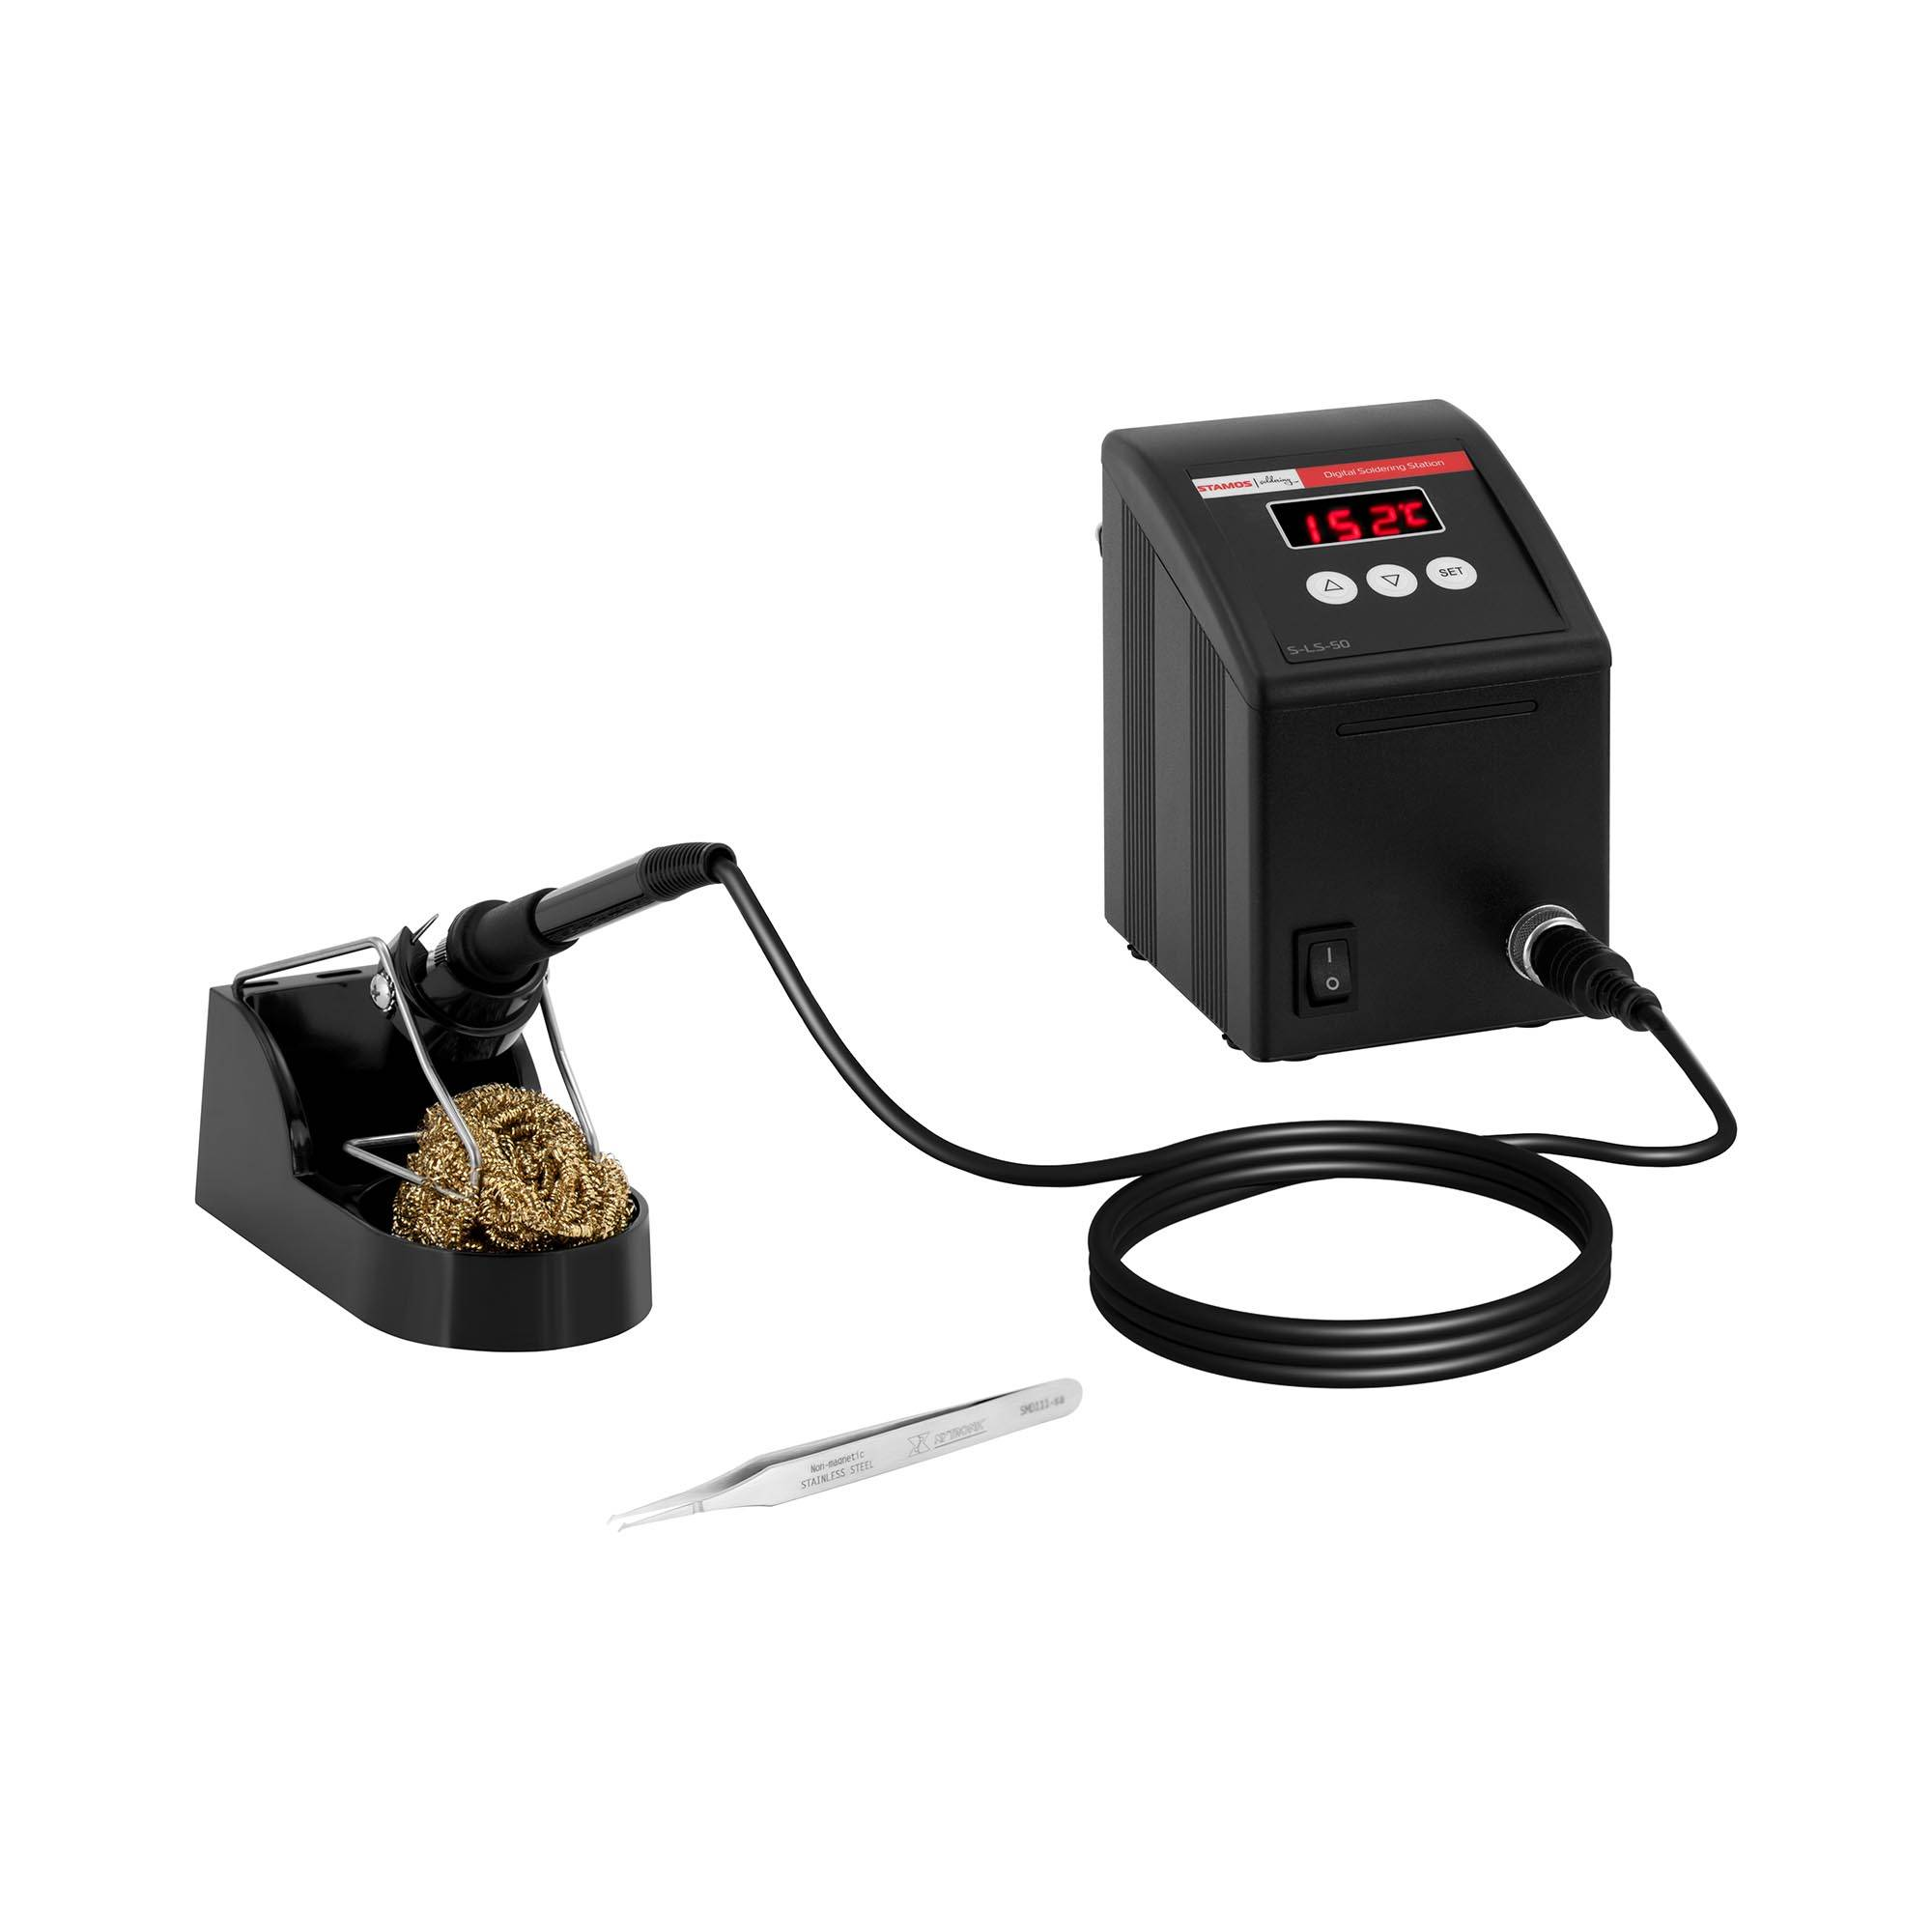 stamos soldering stazione saldante - digitale - 100 w - led s-ls-50